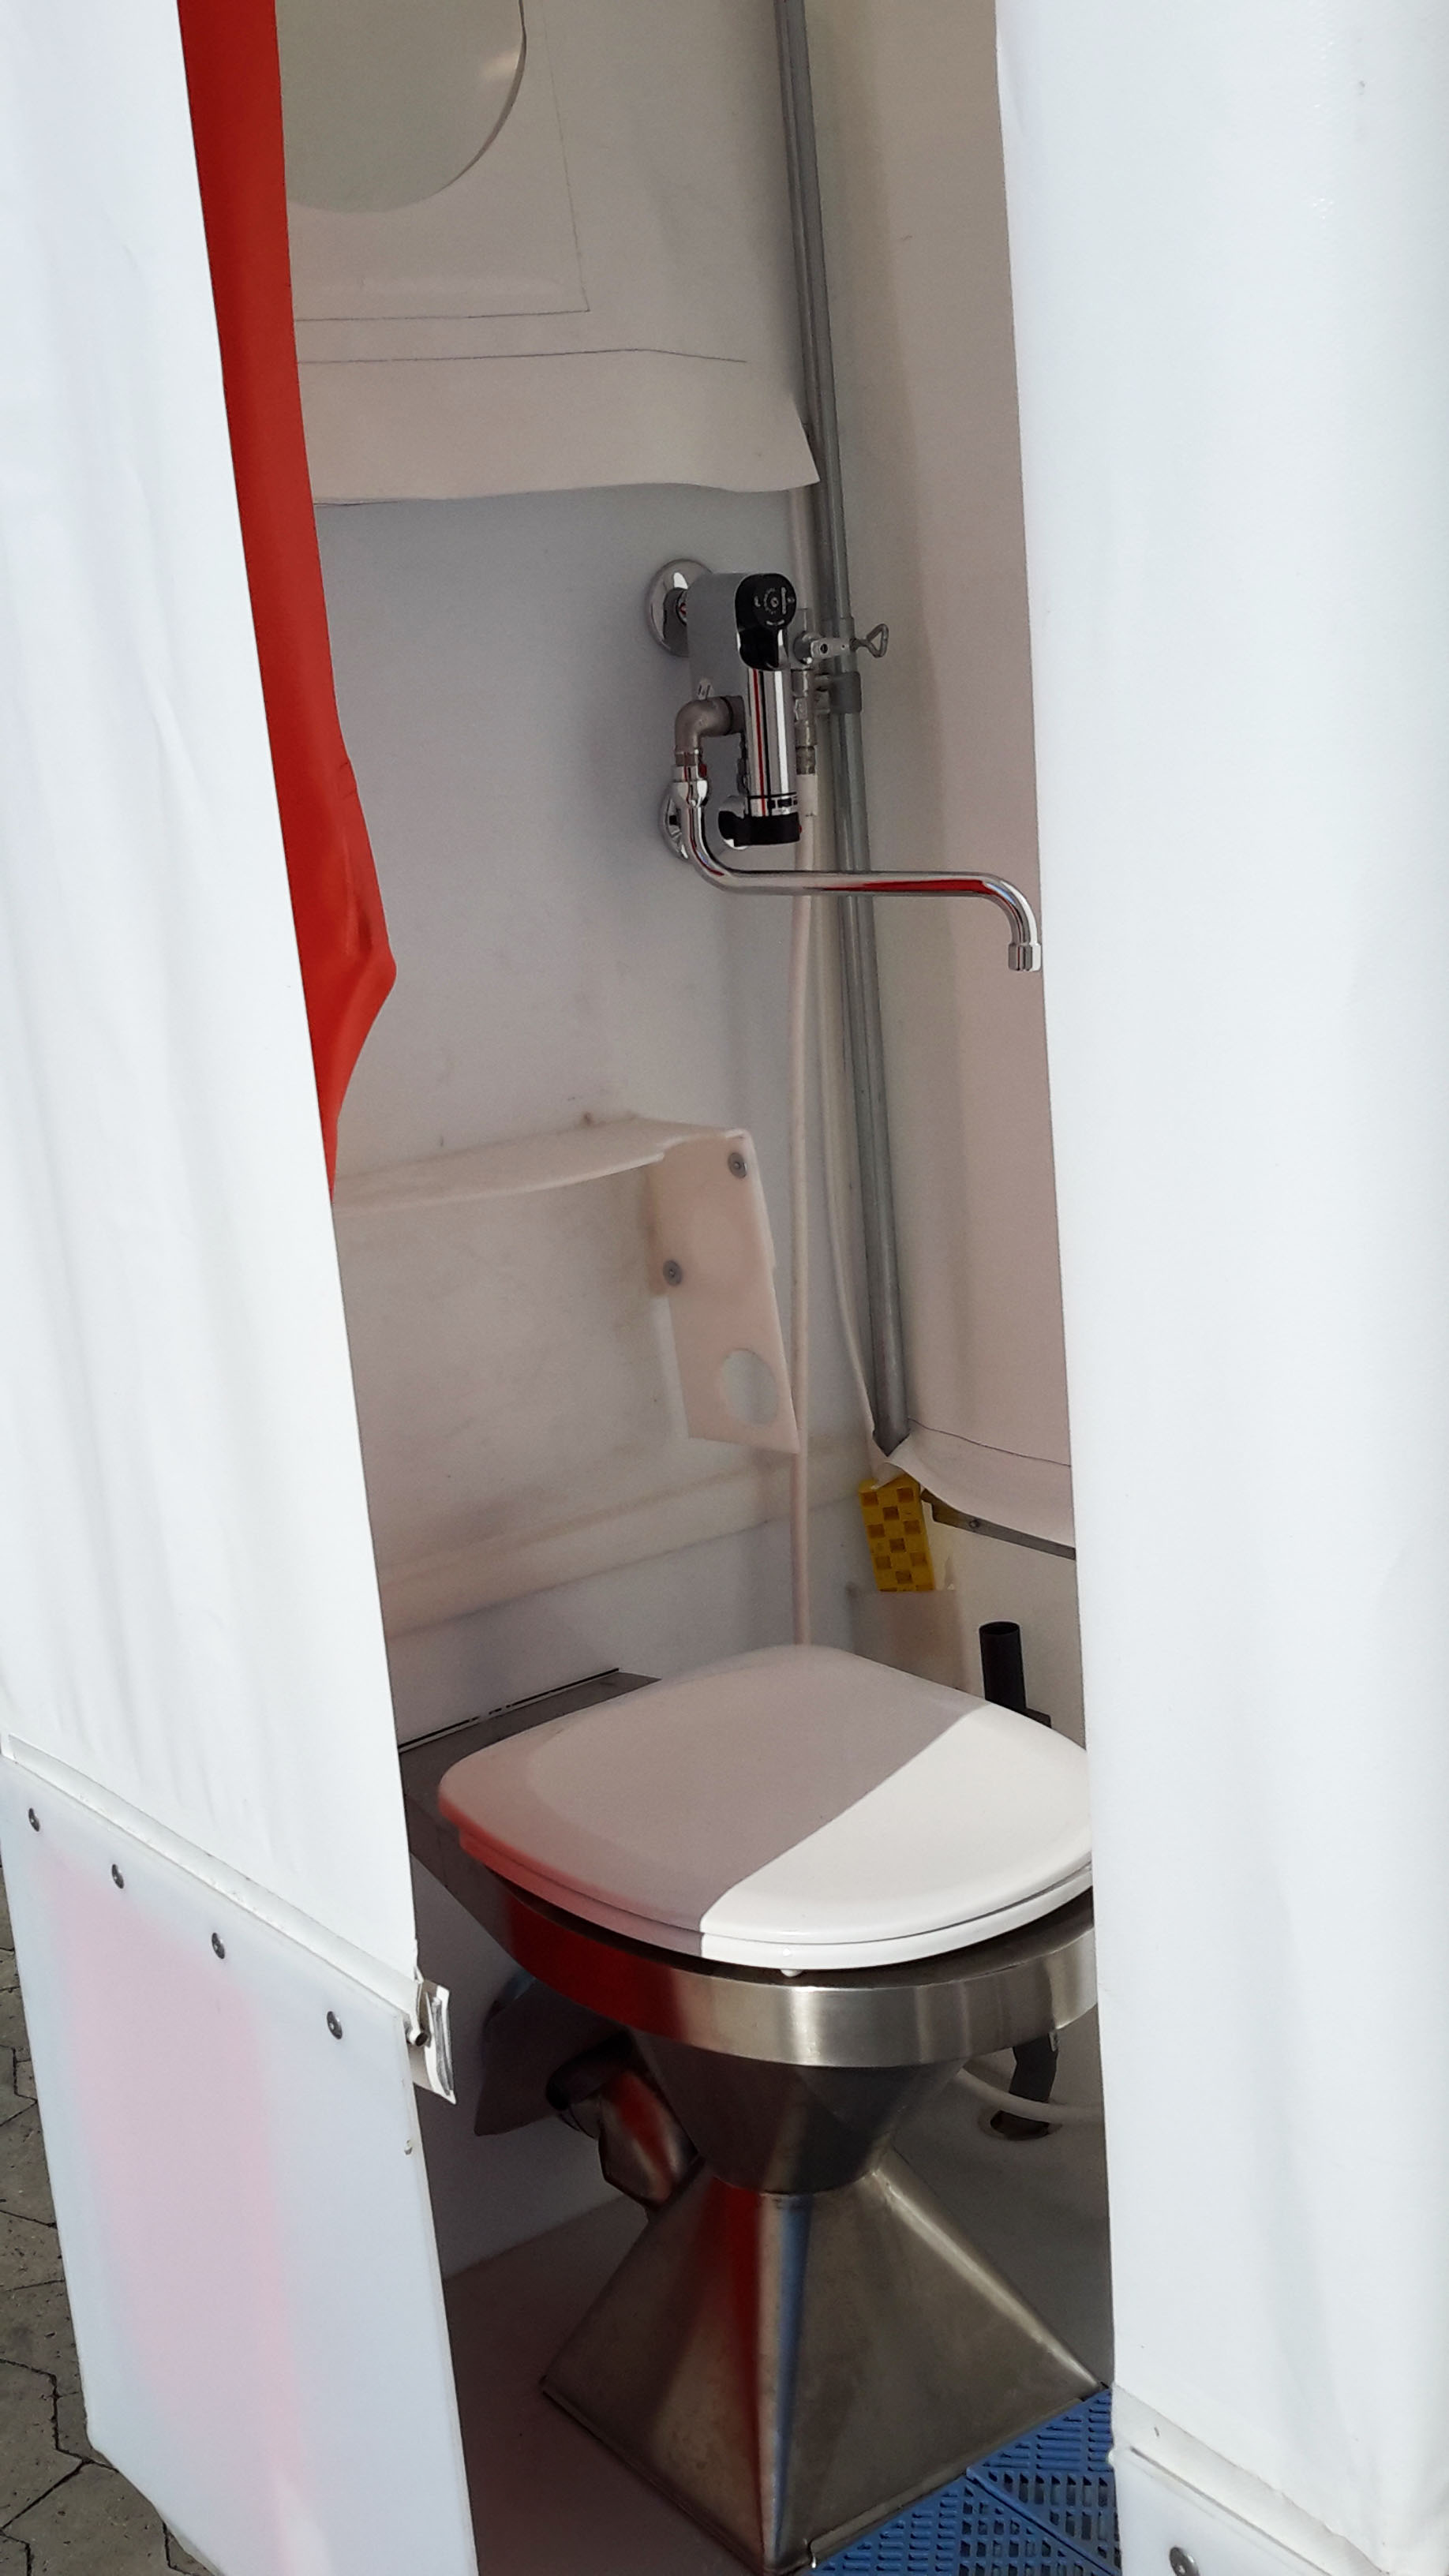 Toiletkabine - inde i